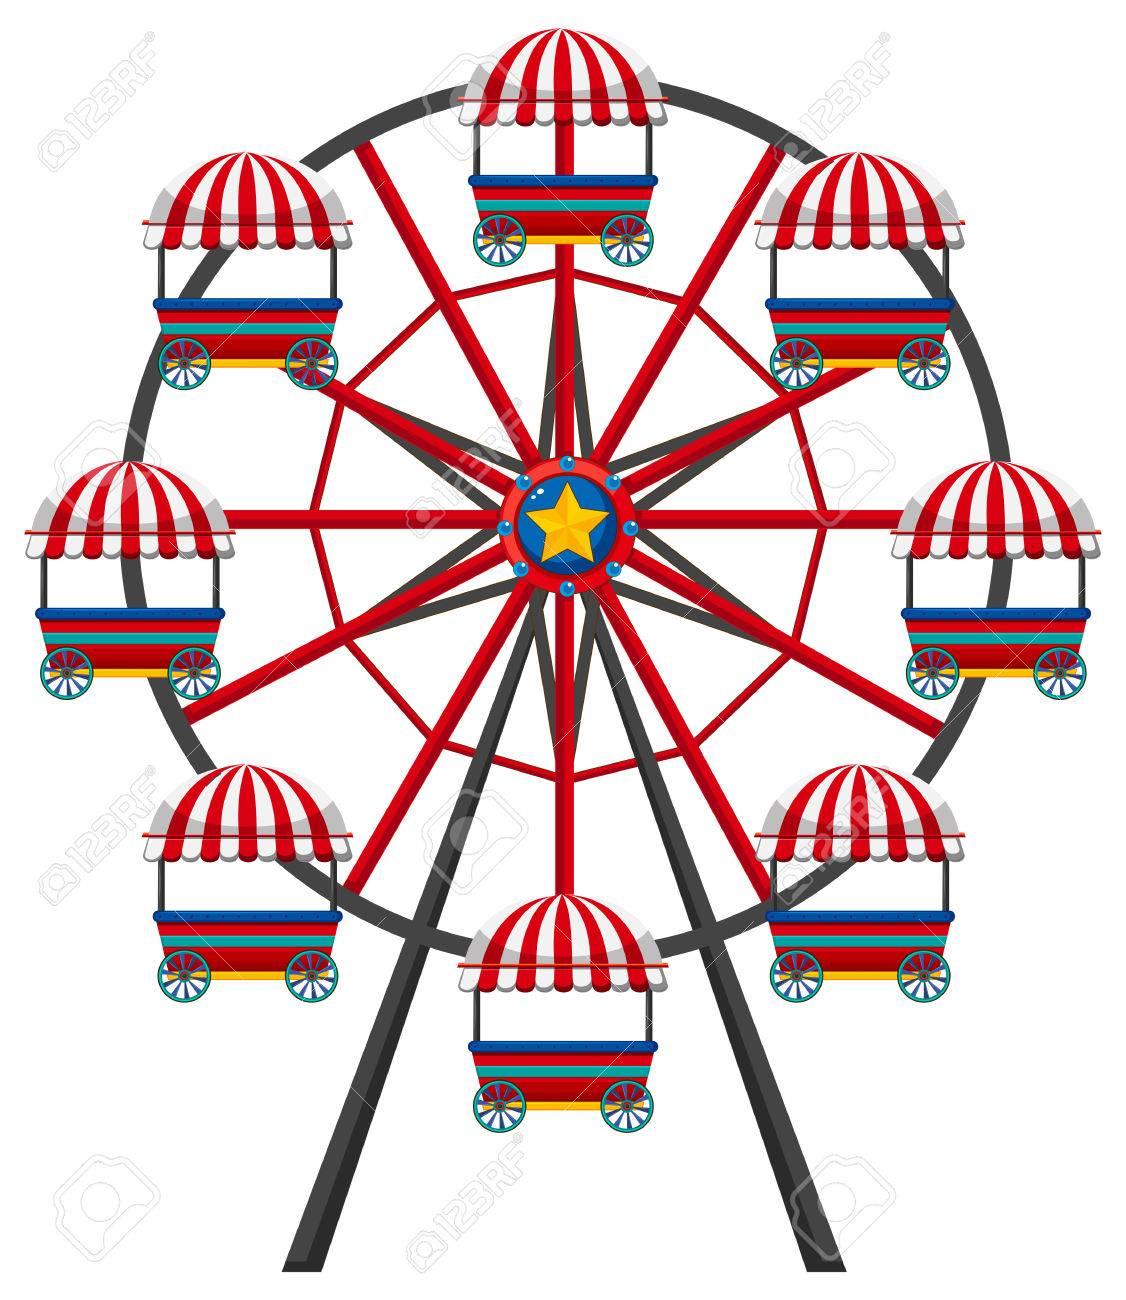 hight resolution of ferris wheel on white background illustration stock vector 74553145